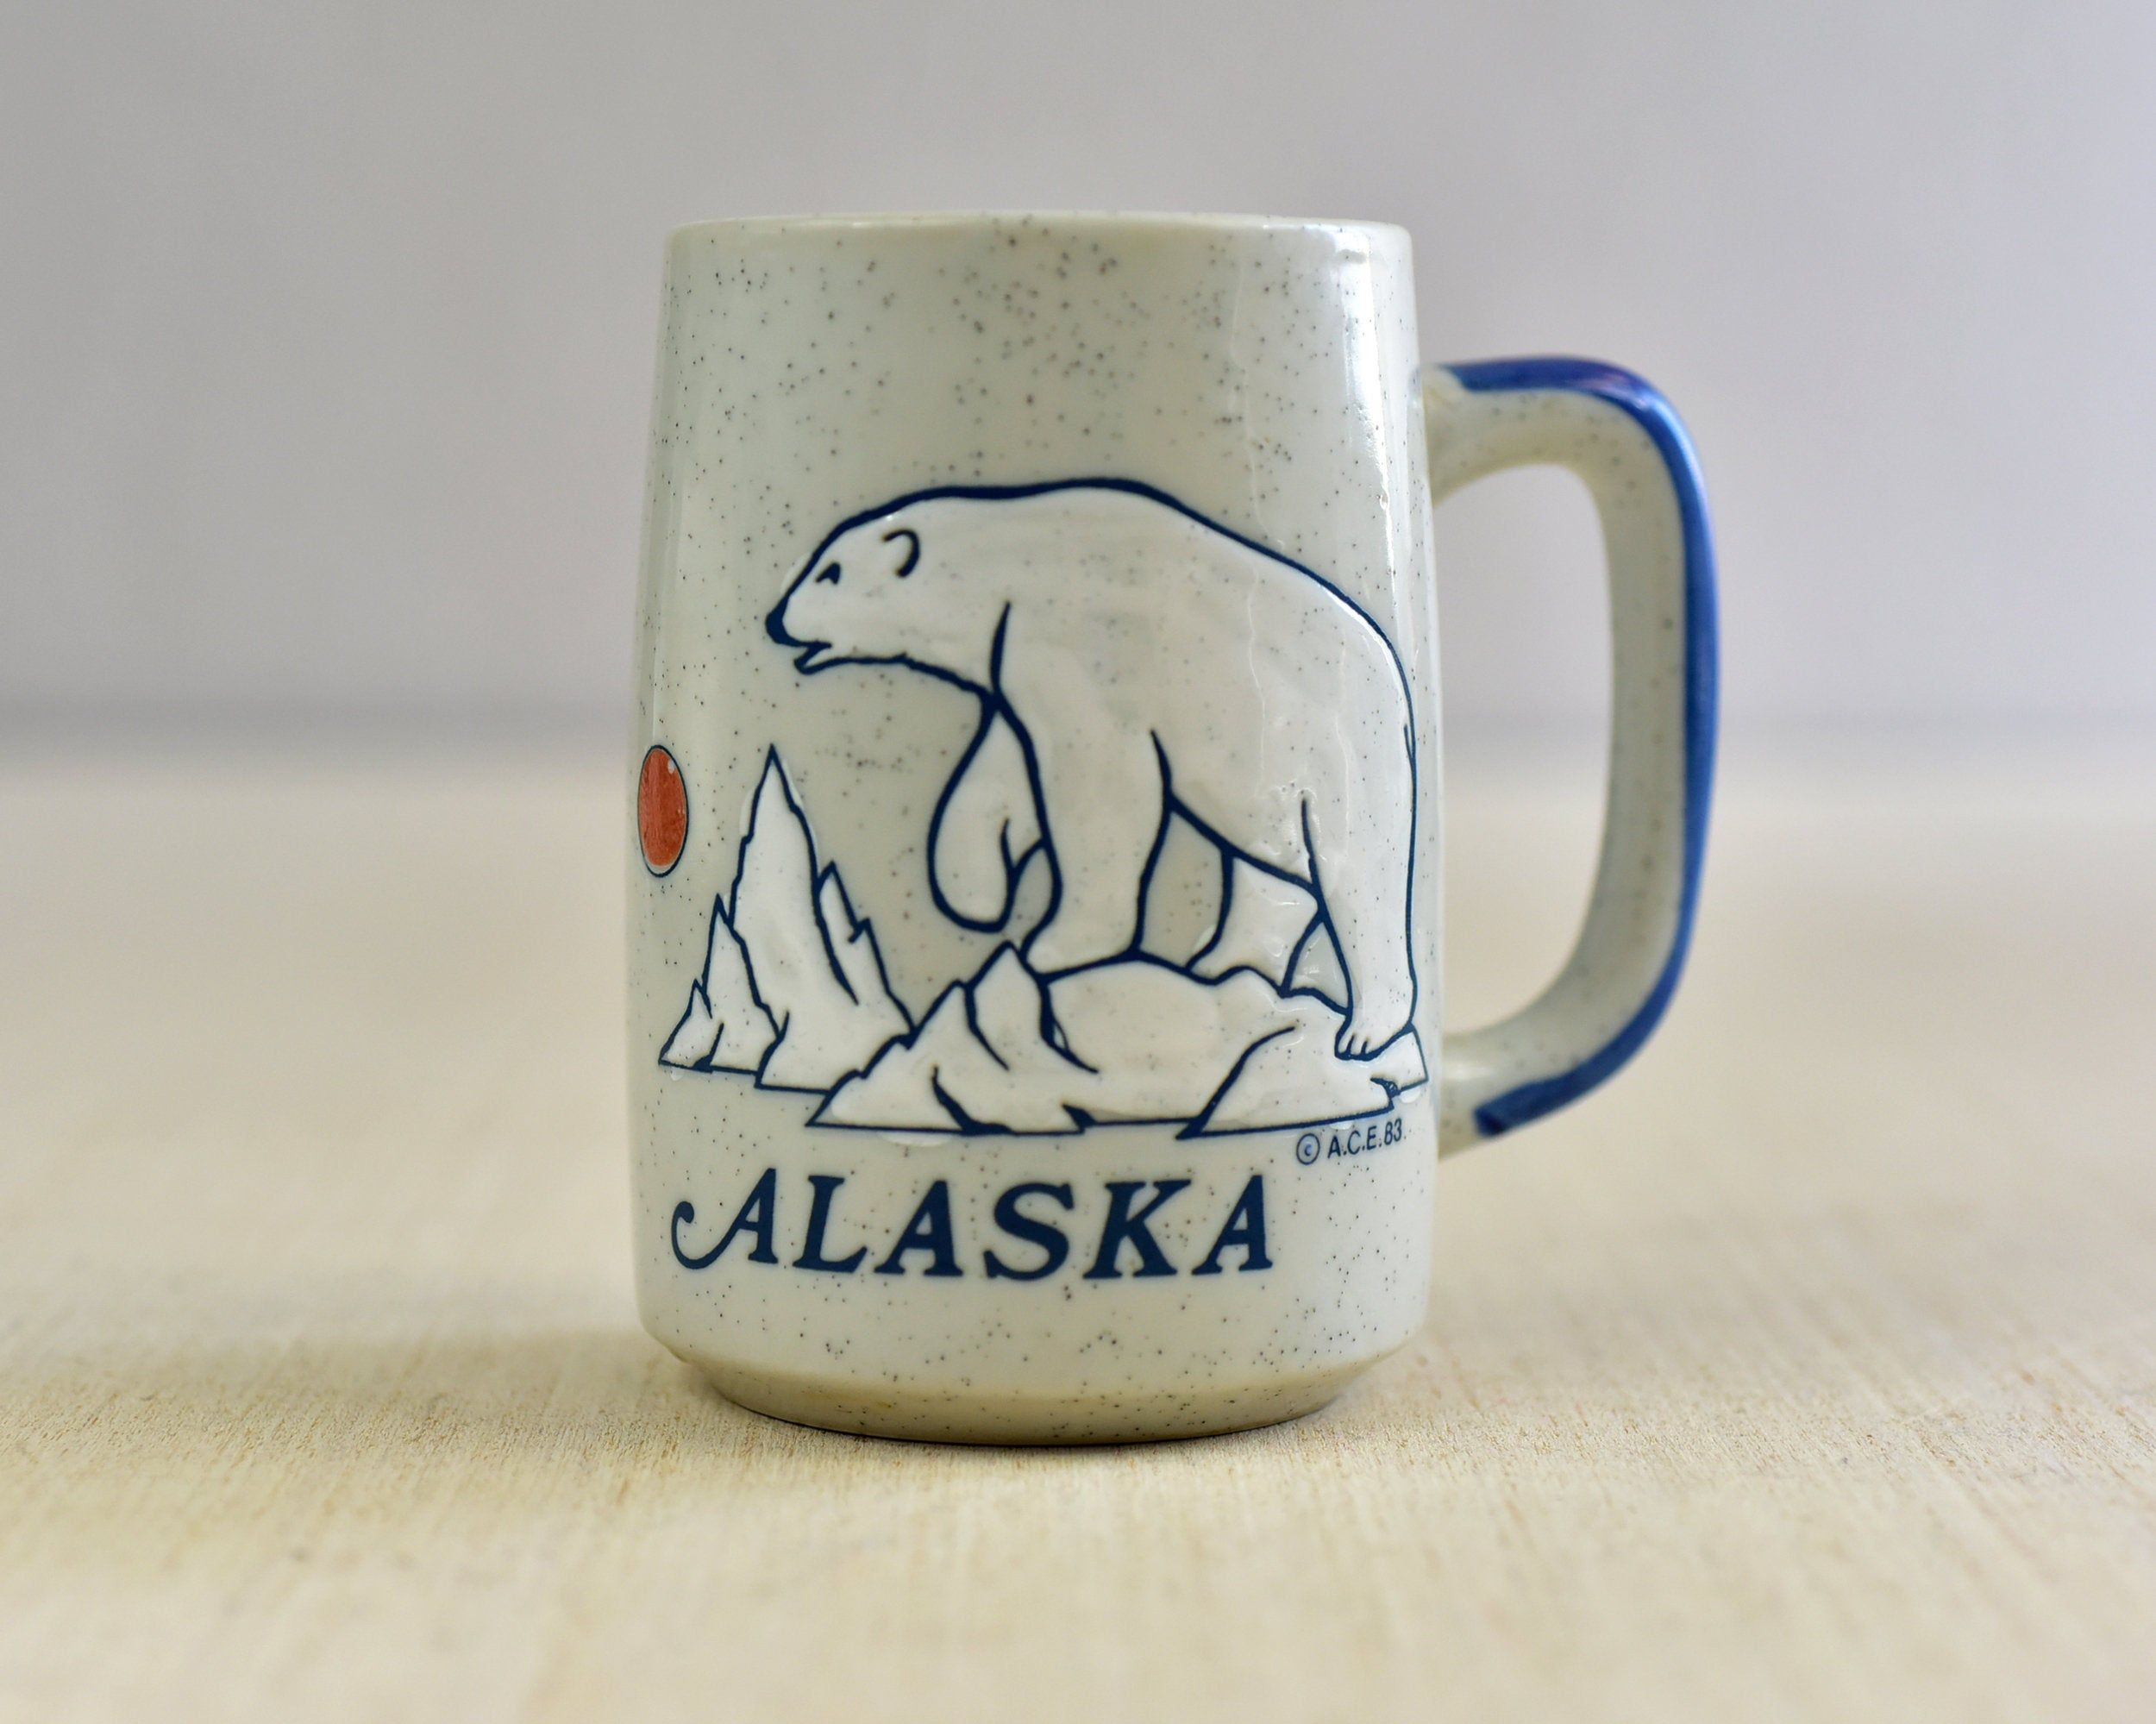 Vintage Alaska Polar Bear Coffee Mug Souvenir Mug Stoneware A C E 83 Ceramic Mug Vintage Ceramic Mugs Ceramic Mug [ 1999 x 2500 Pixel ]